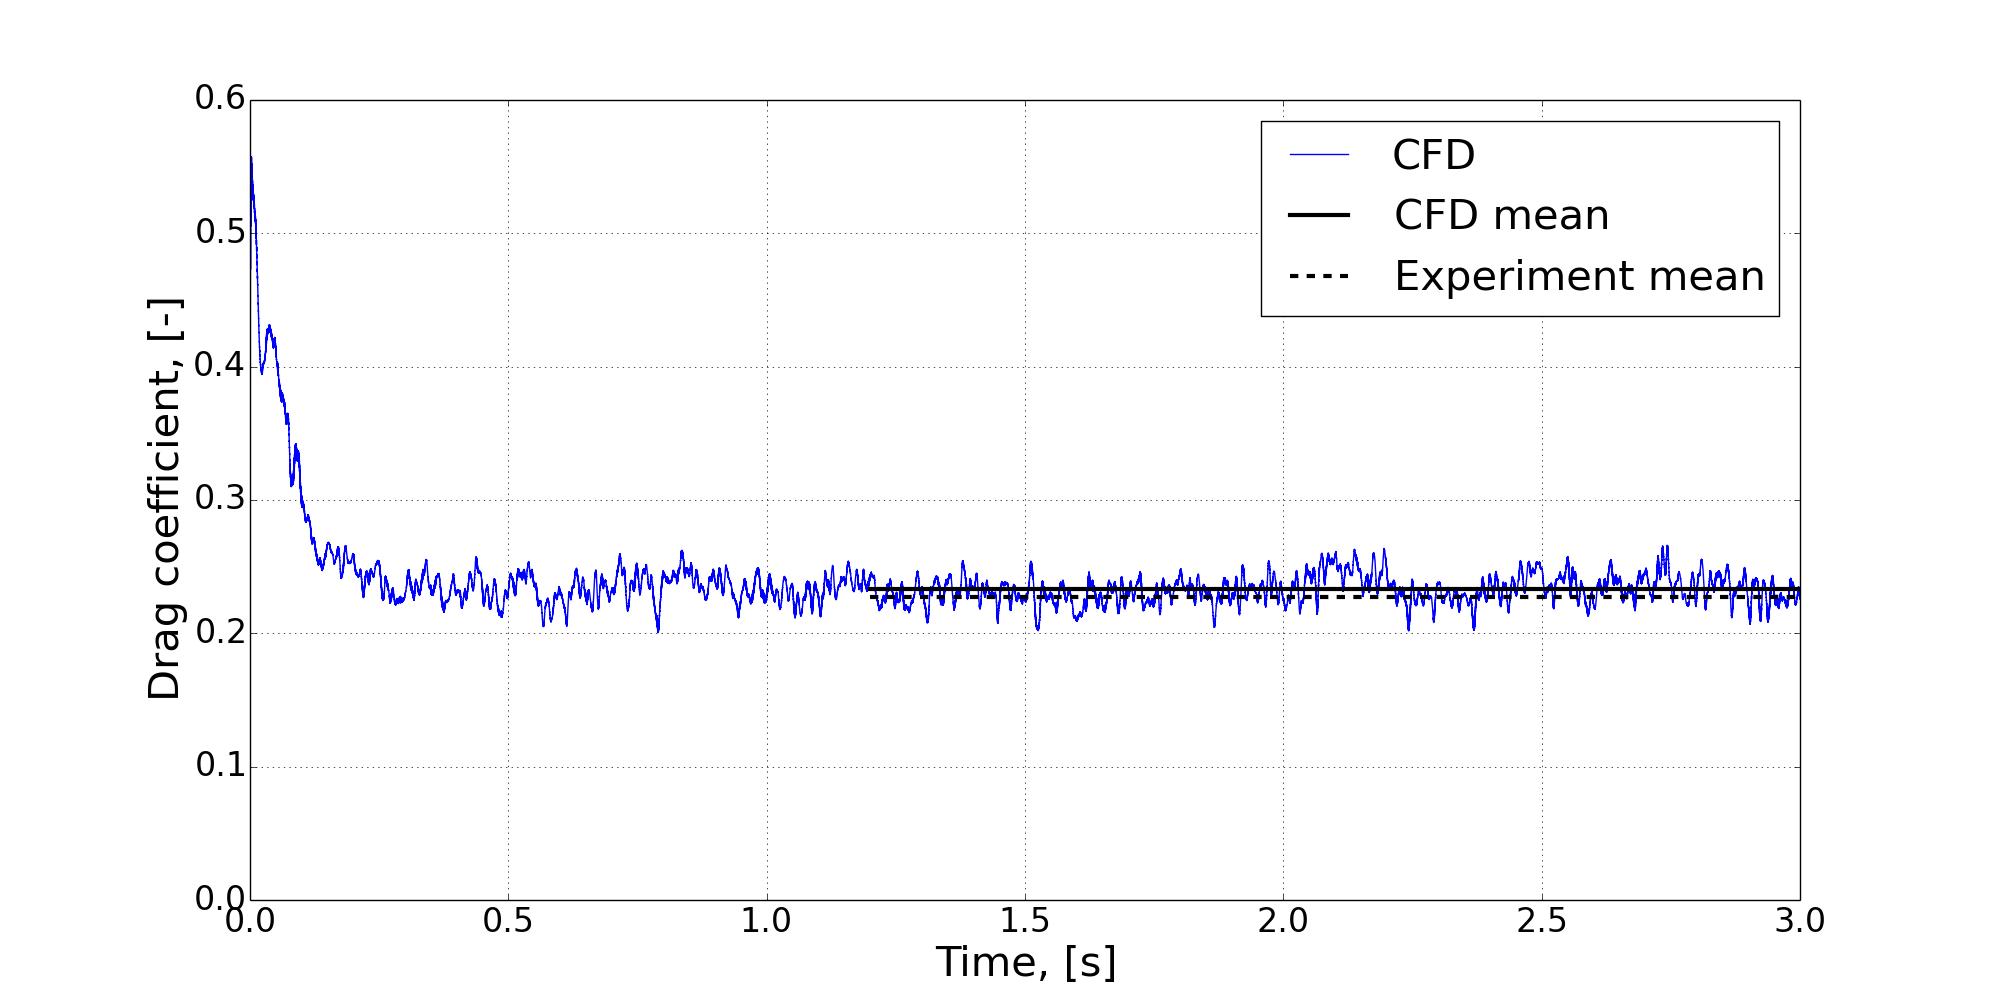 transient response drag coefficient car computational fluid dynamics CFD experiment